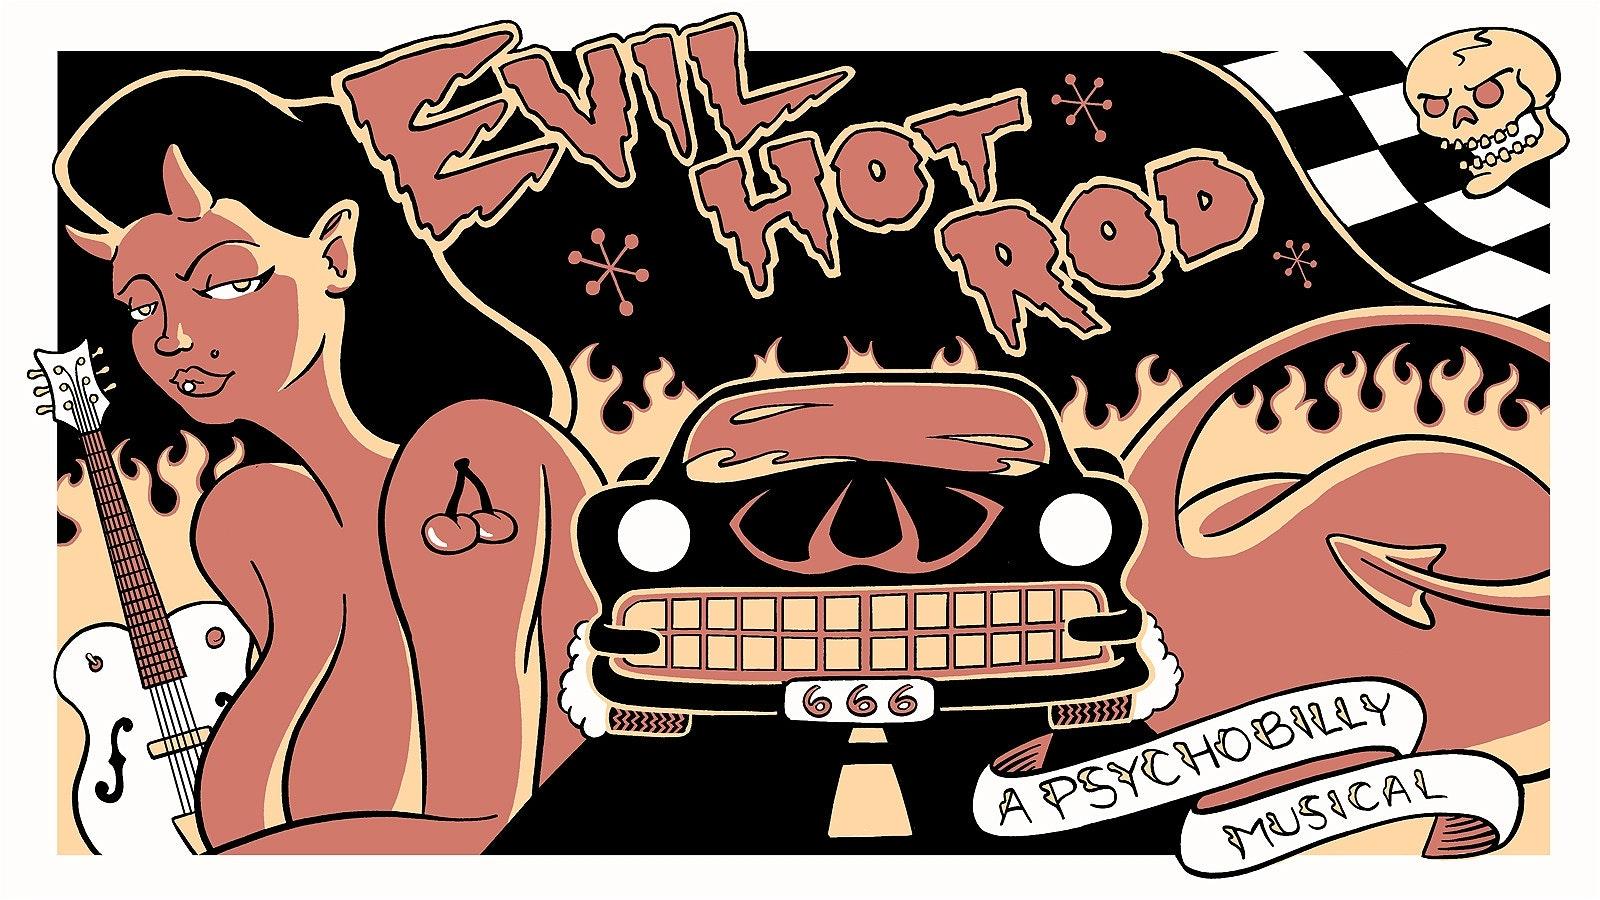 Evil Hot Rod - A Psychobilly Radio Musical